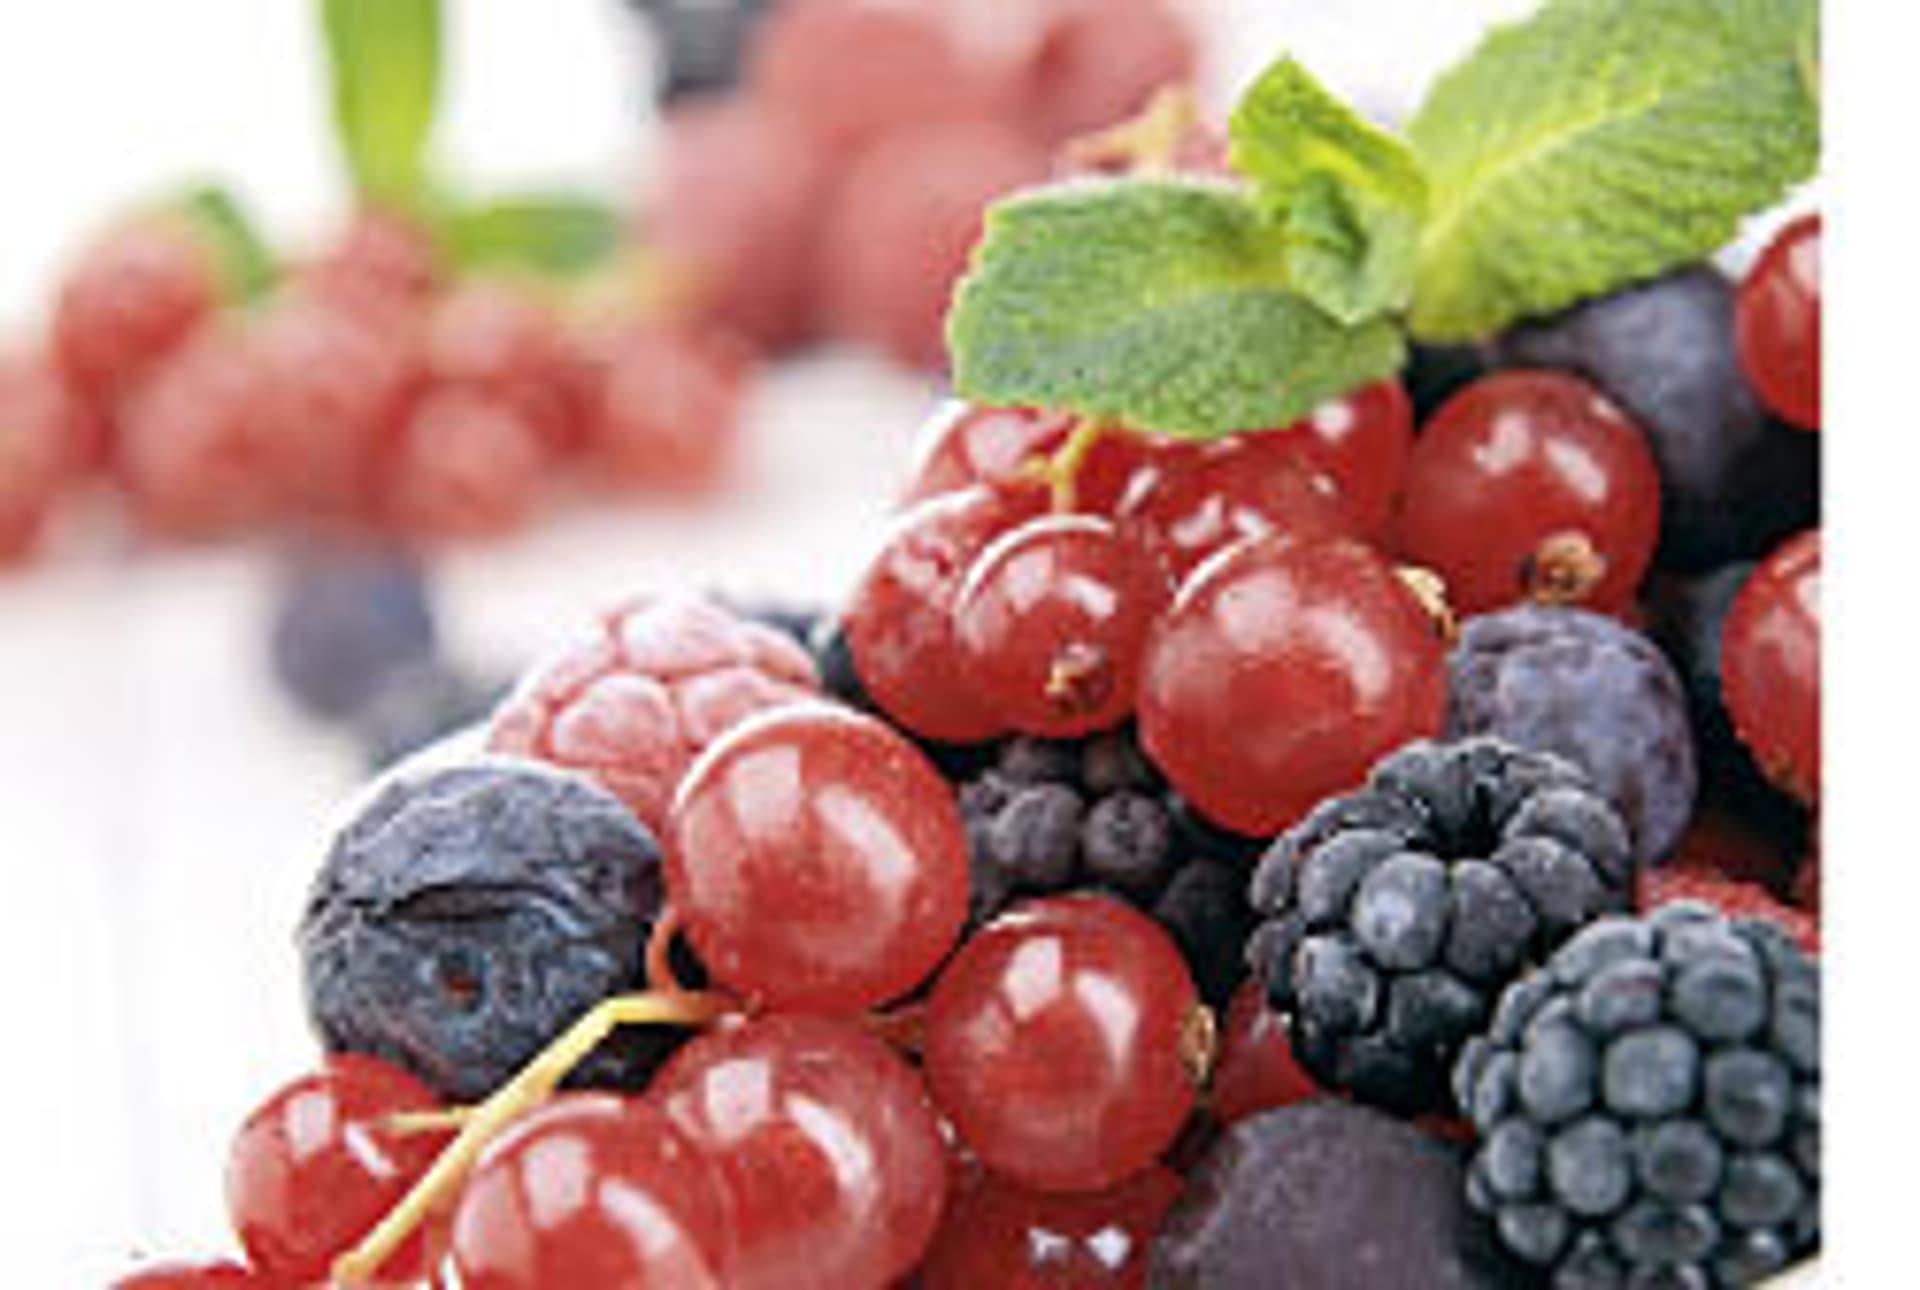 Beeren Lebensmittelunverträglichkeit